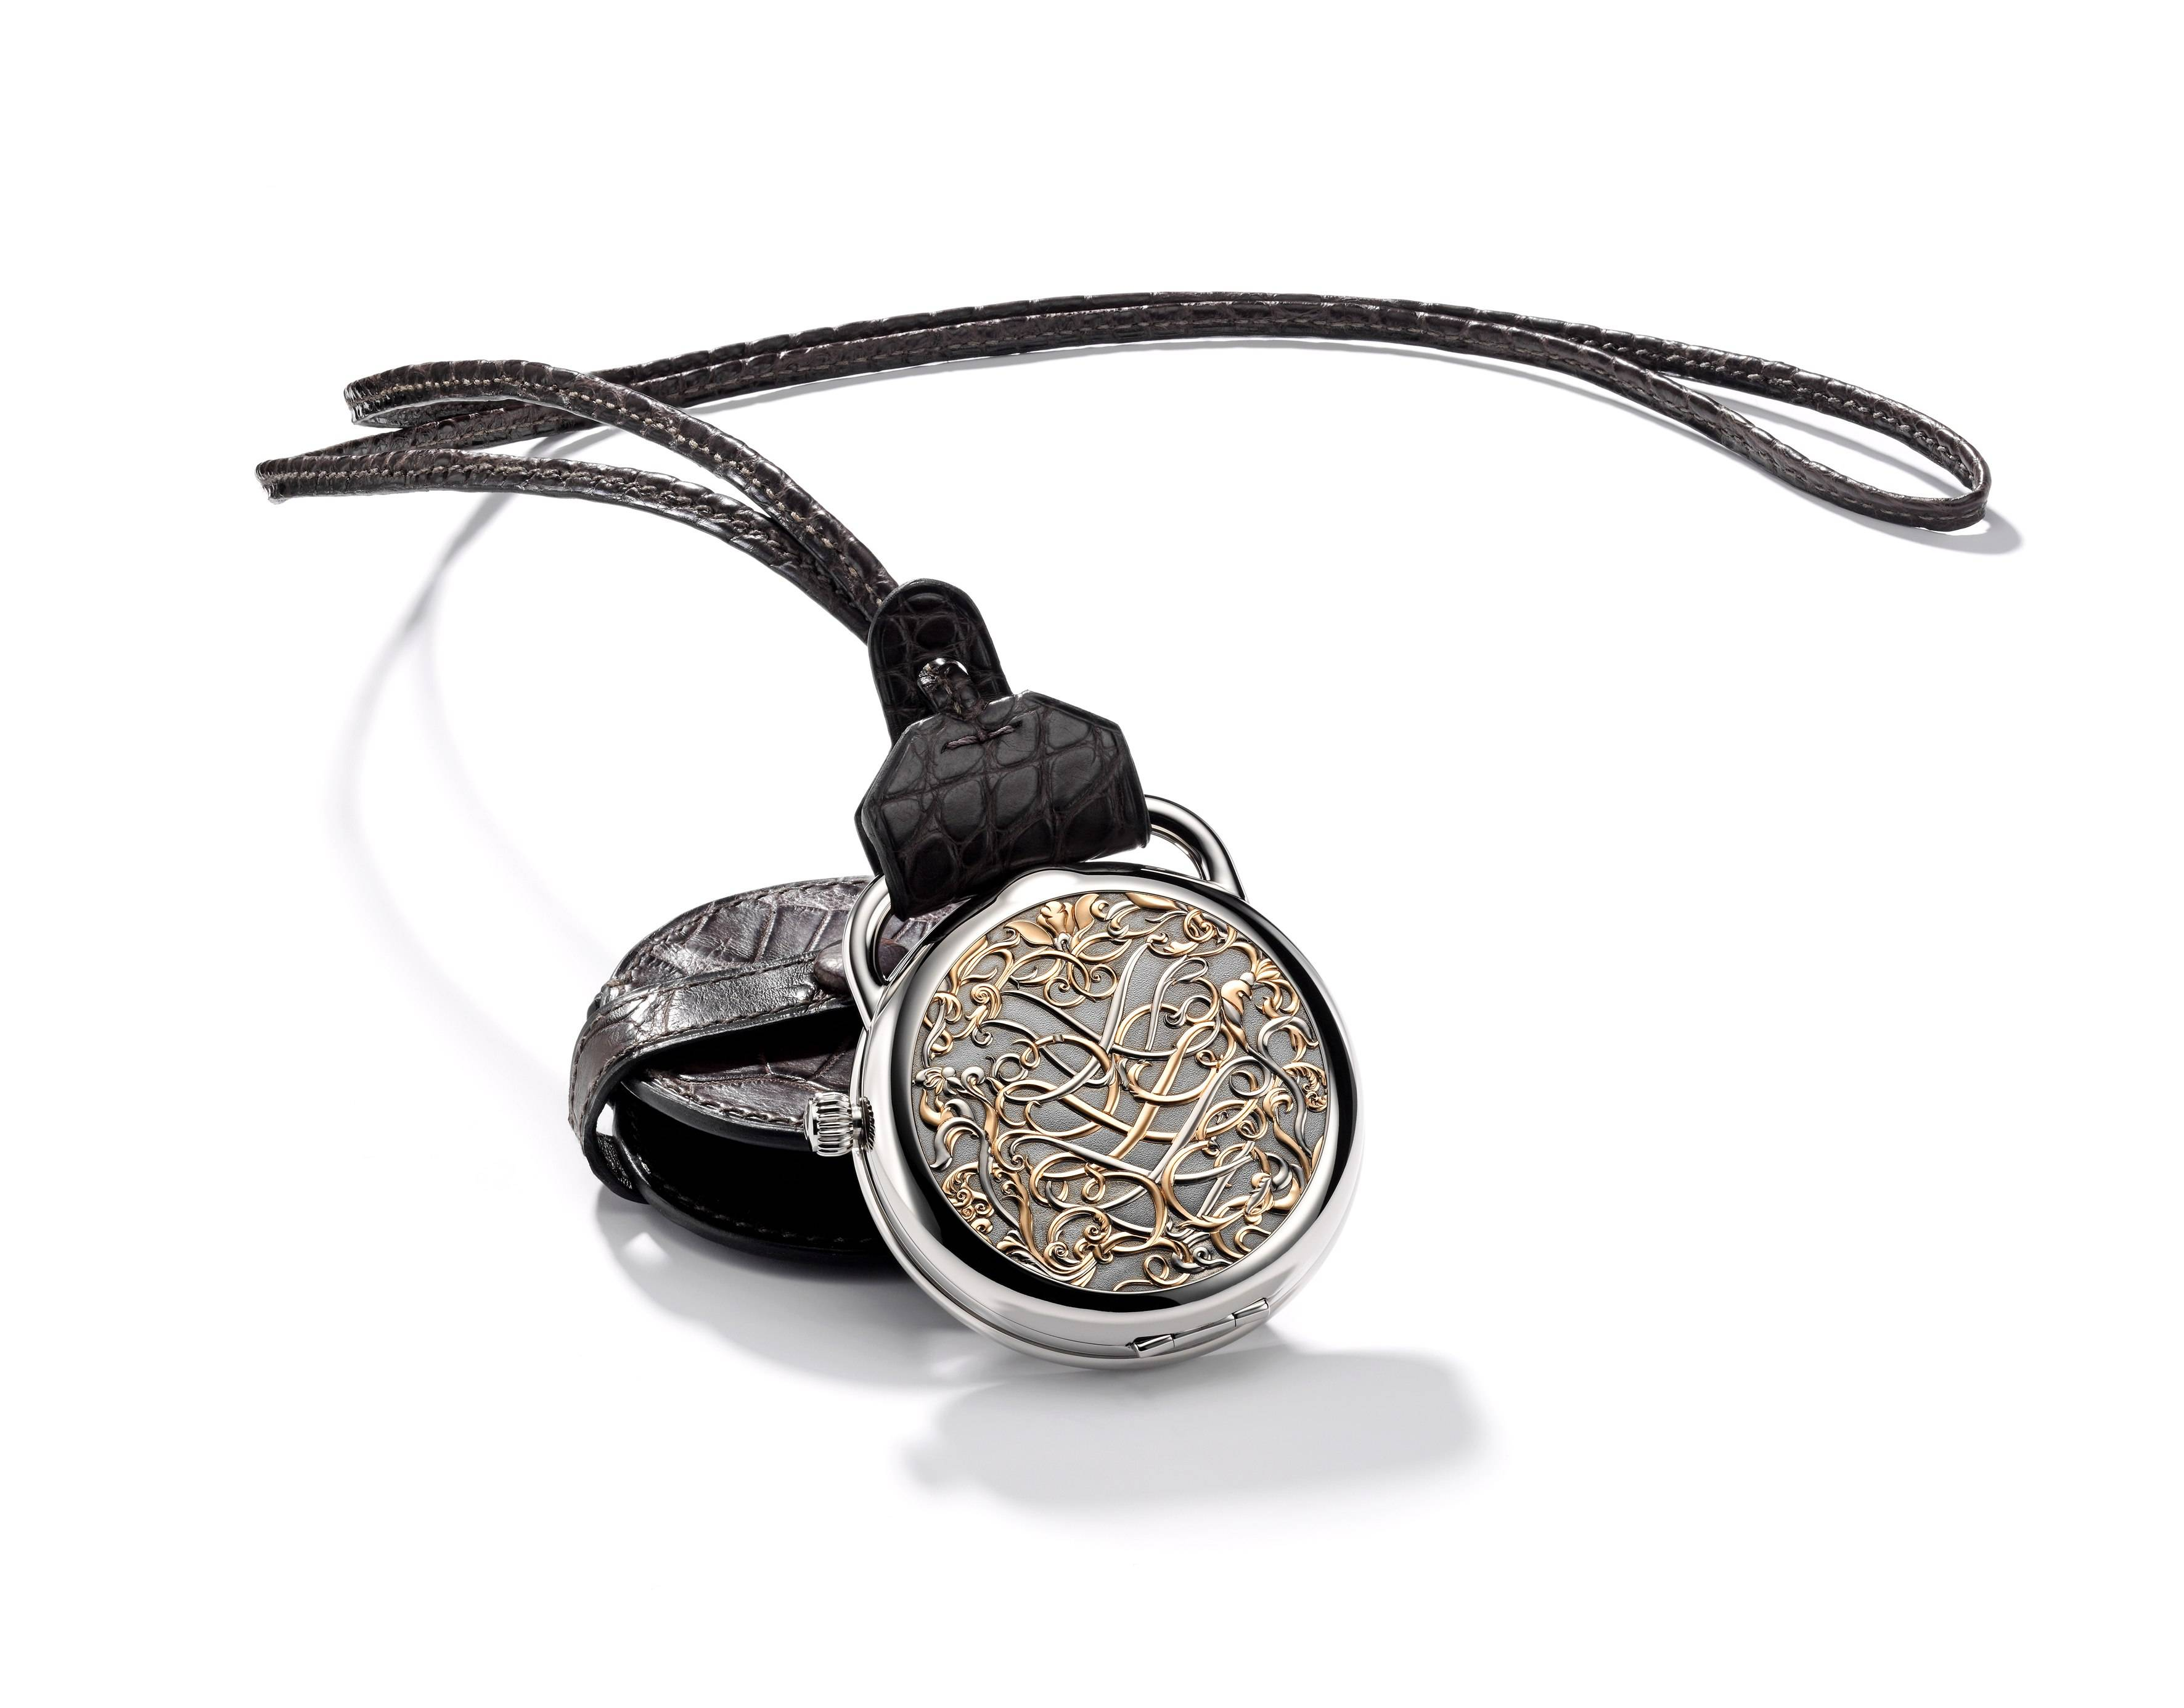 Hermès Pocket Watch Spotlights Craftsmanship